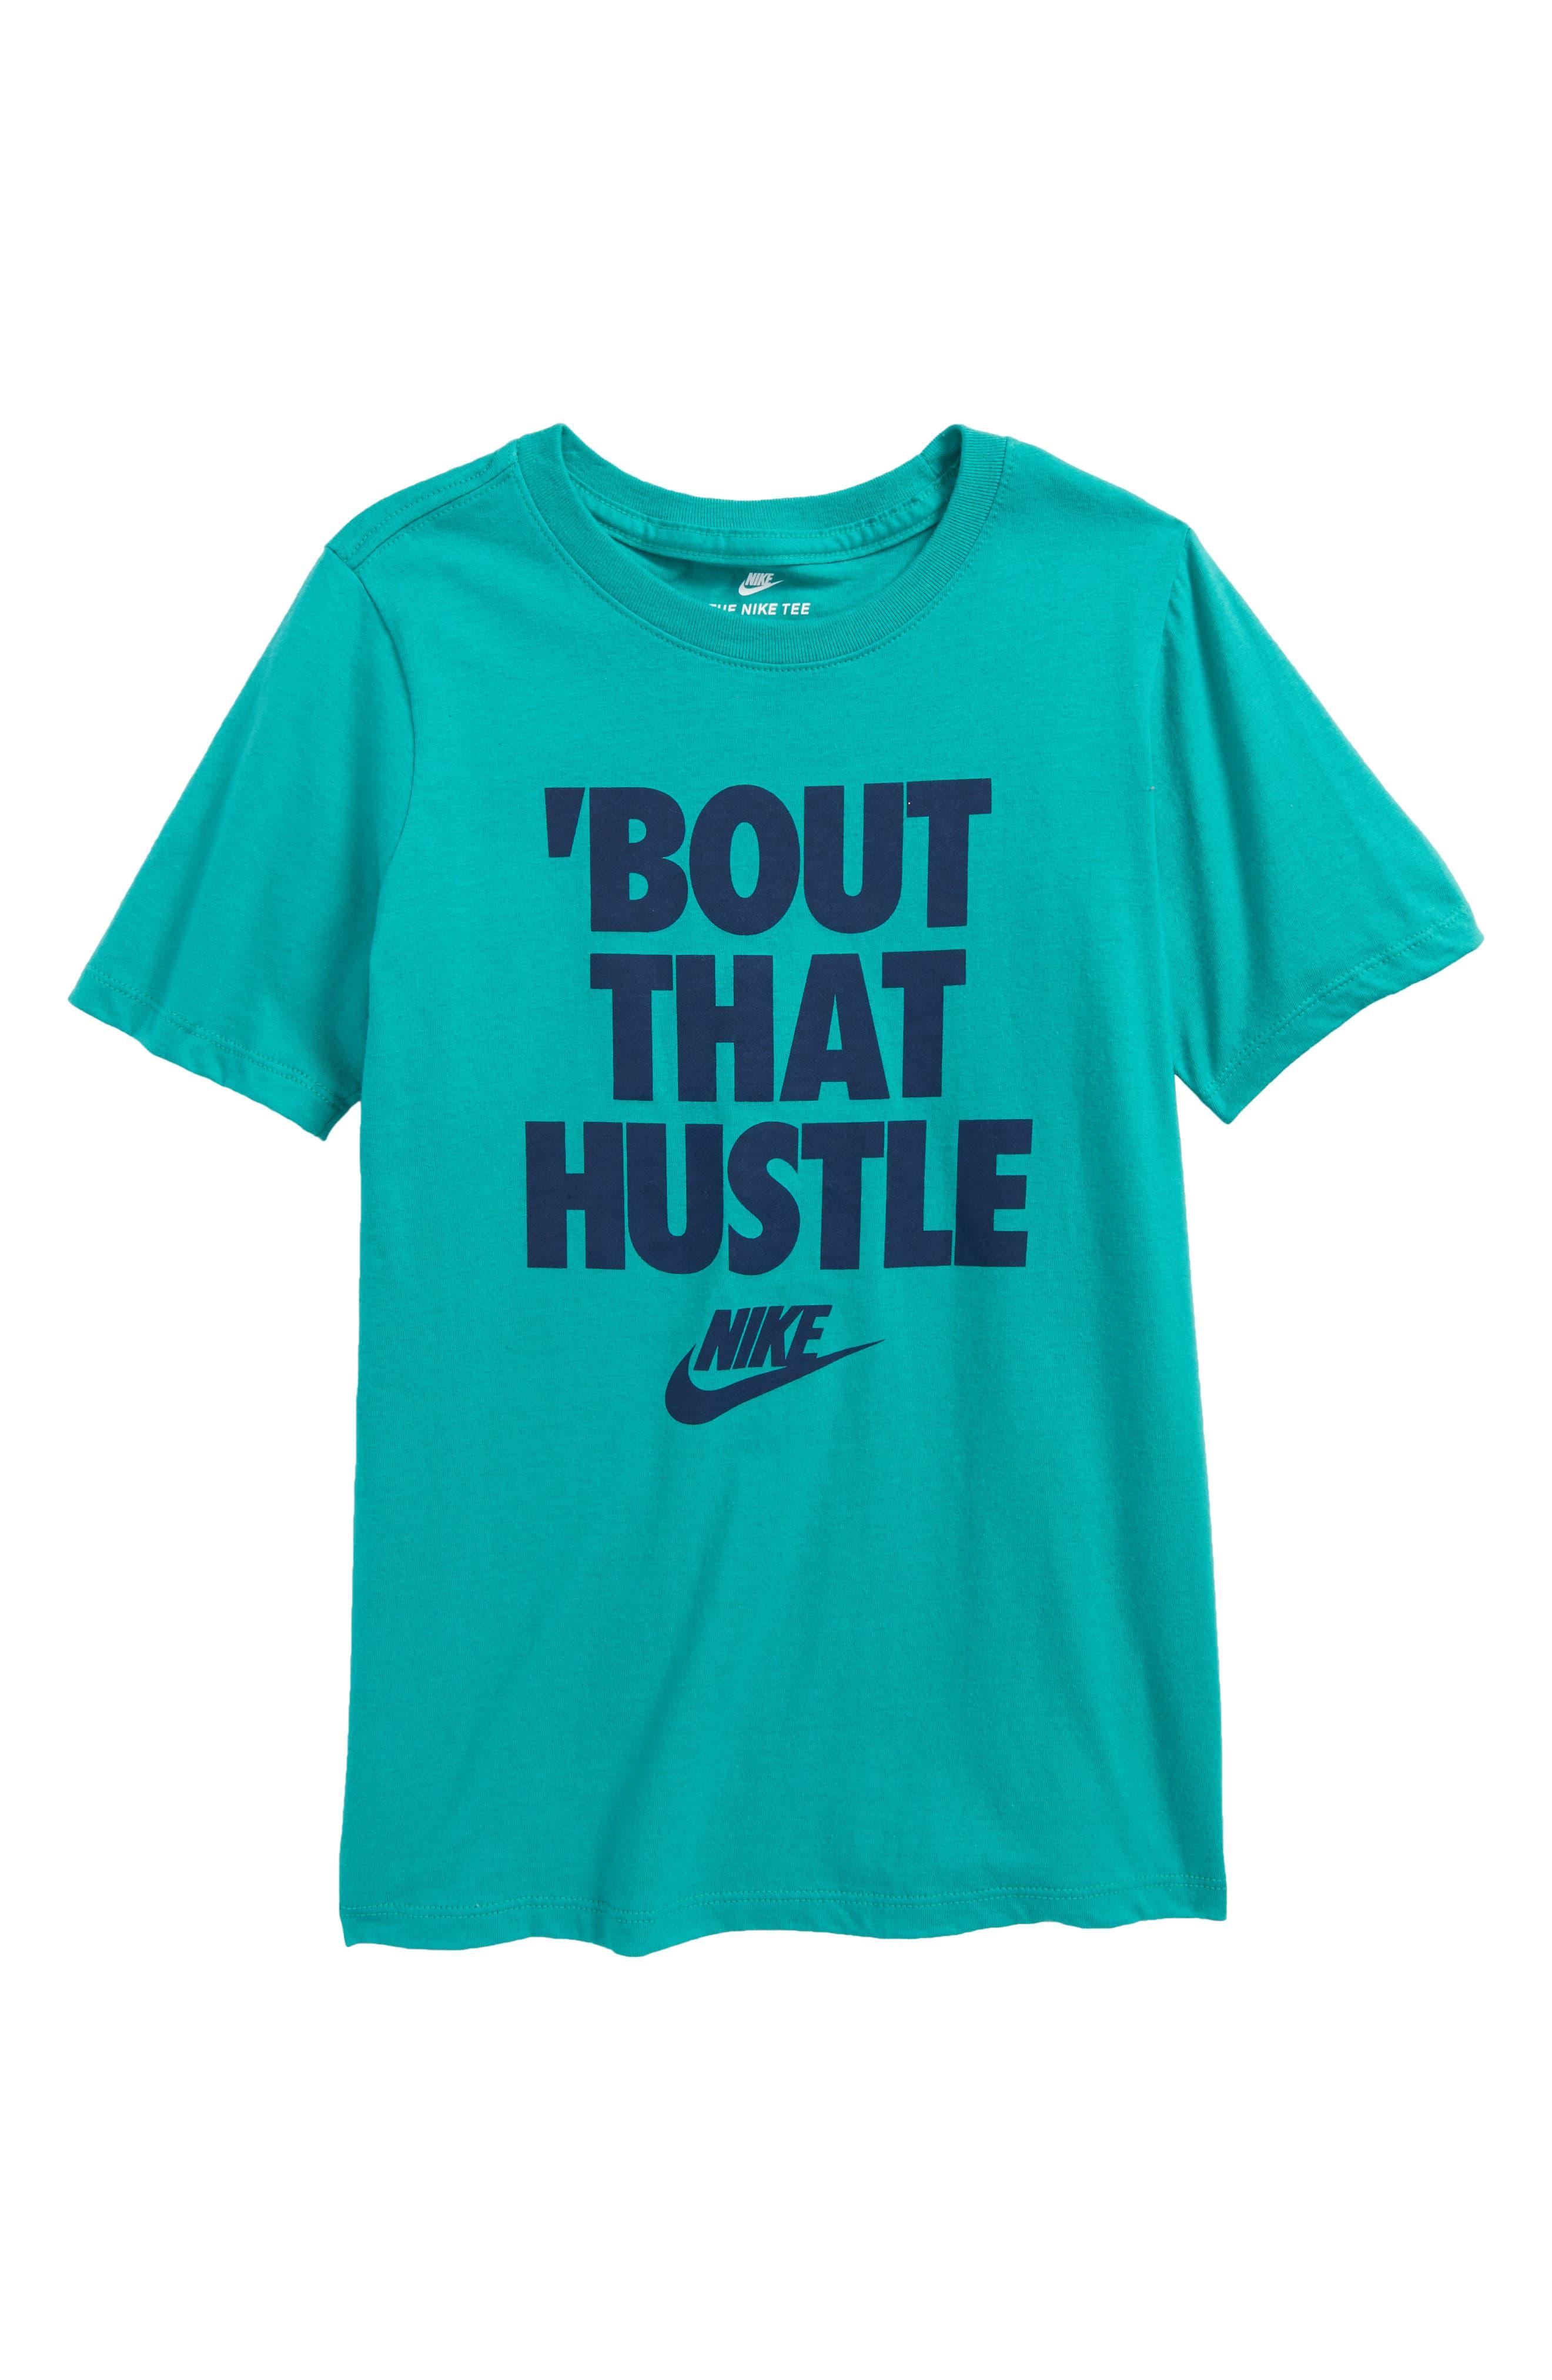 Alternate Image 1 Selected - Nike Hustle Graphic T-Shirt (Little Boys & Big Boys)